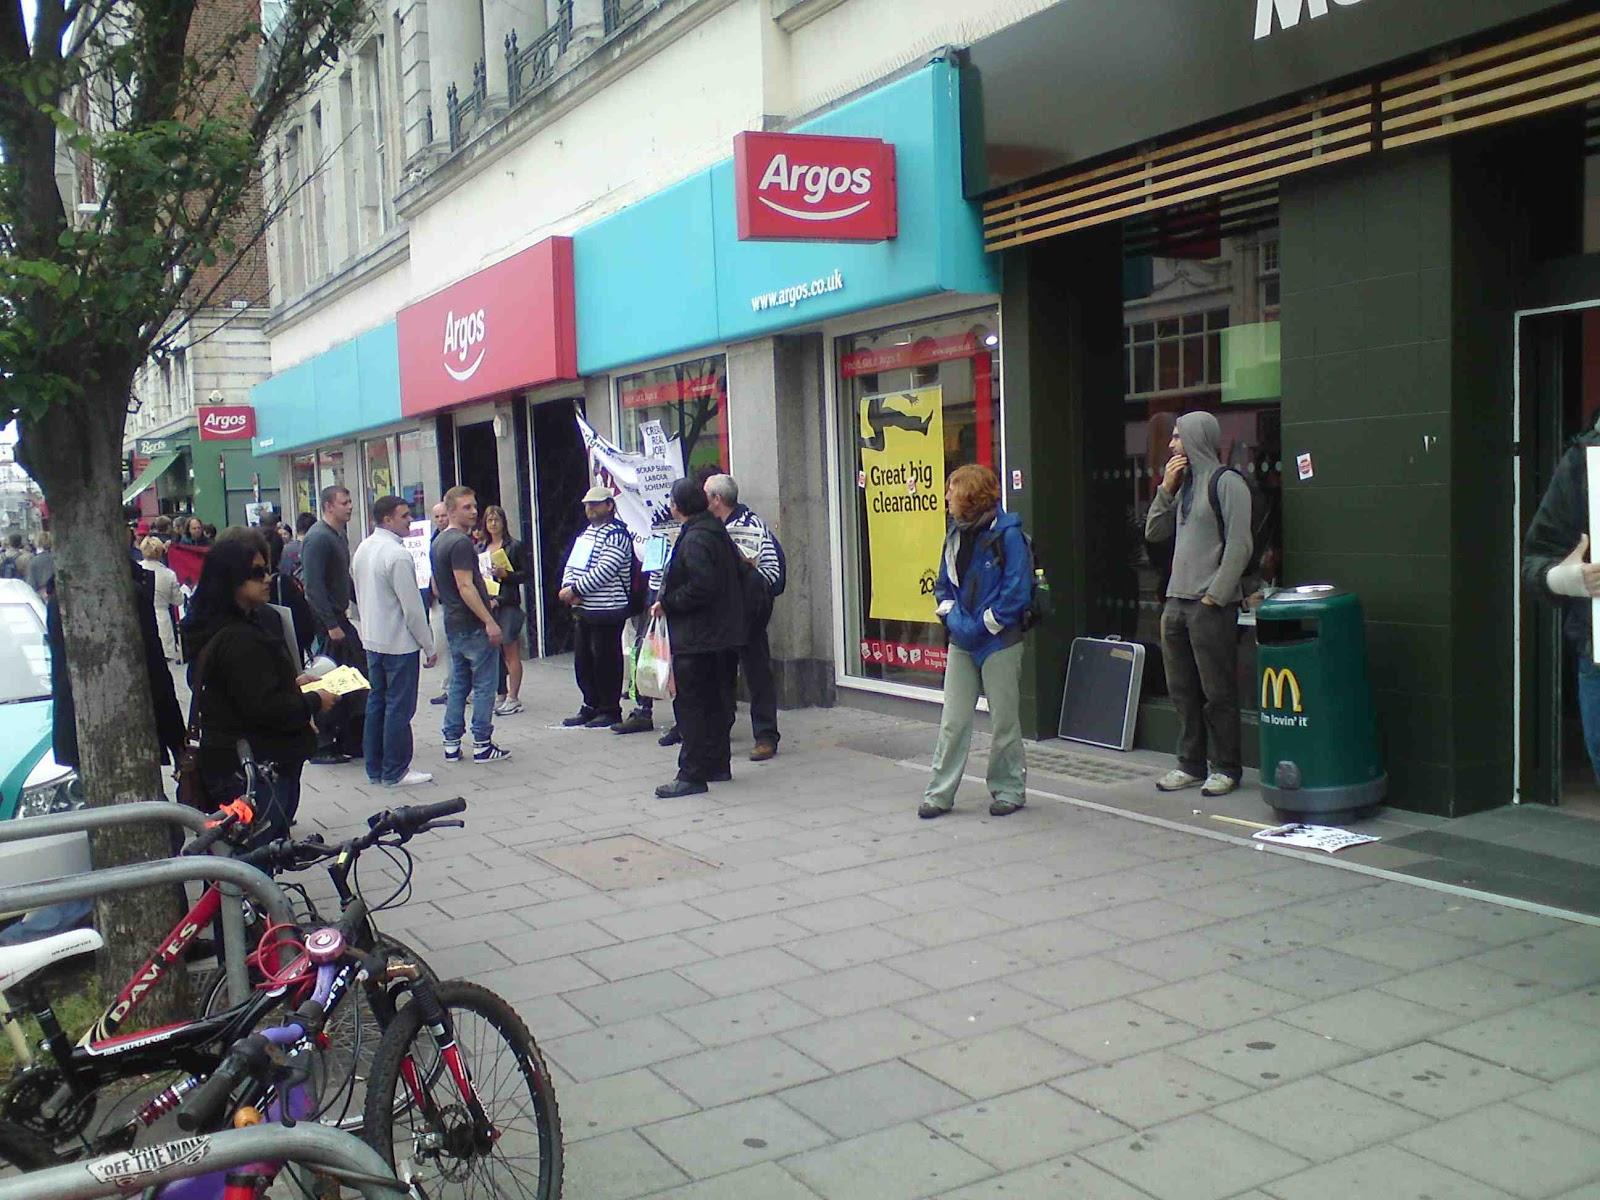 Tony Greenstein Blog: Tony Greenstein's Blog: Brighton March Of Shame A Great